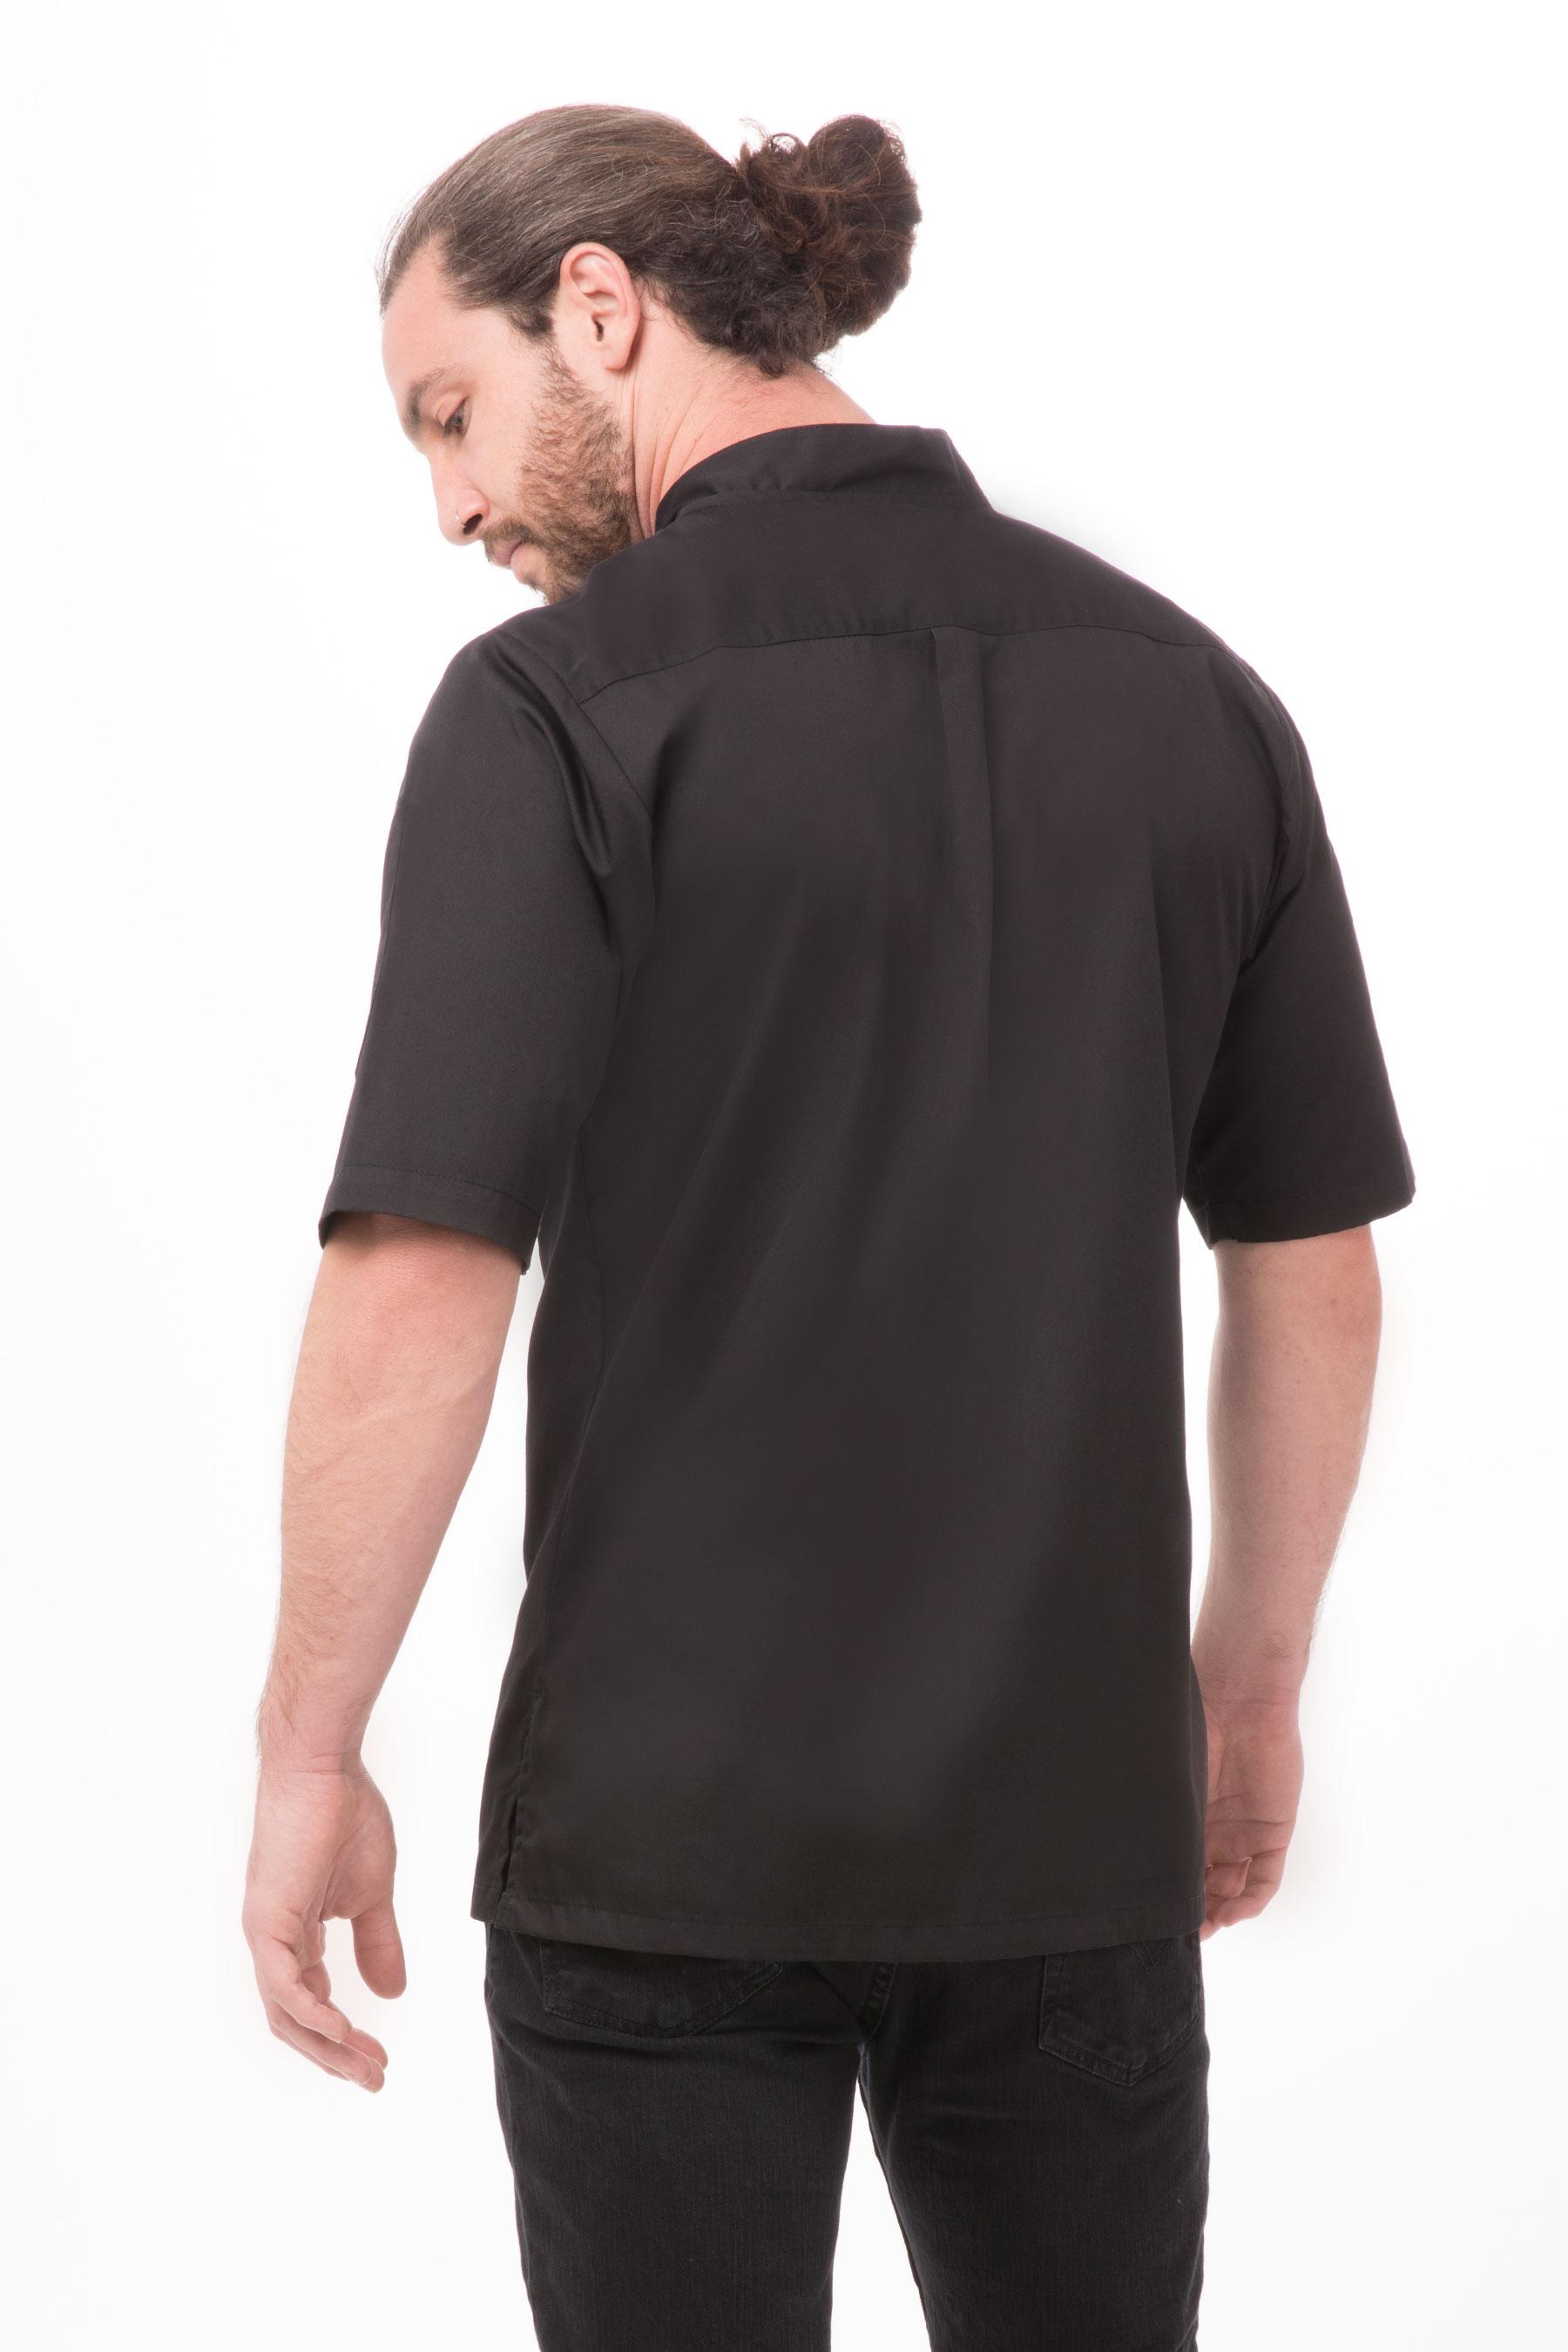 Avignon Bistro Shirt